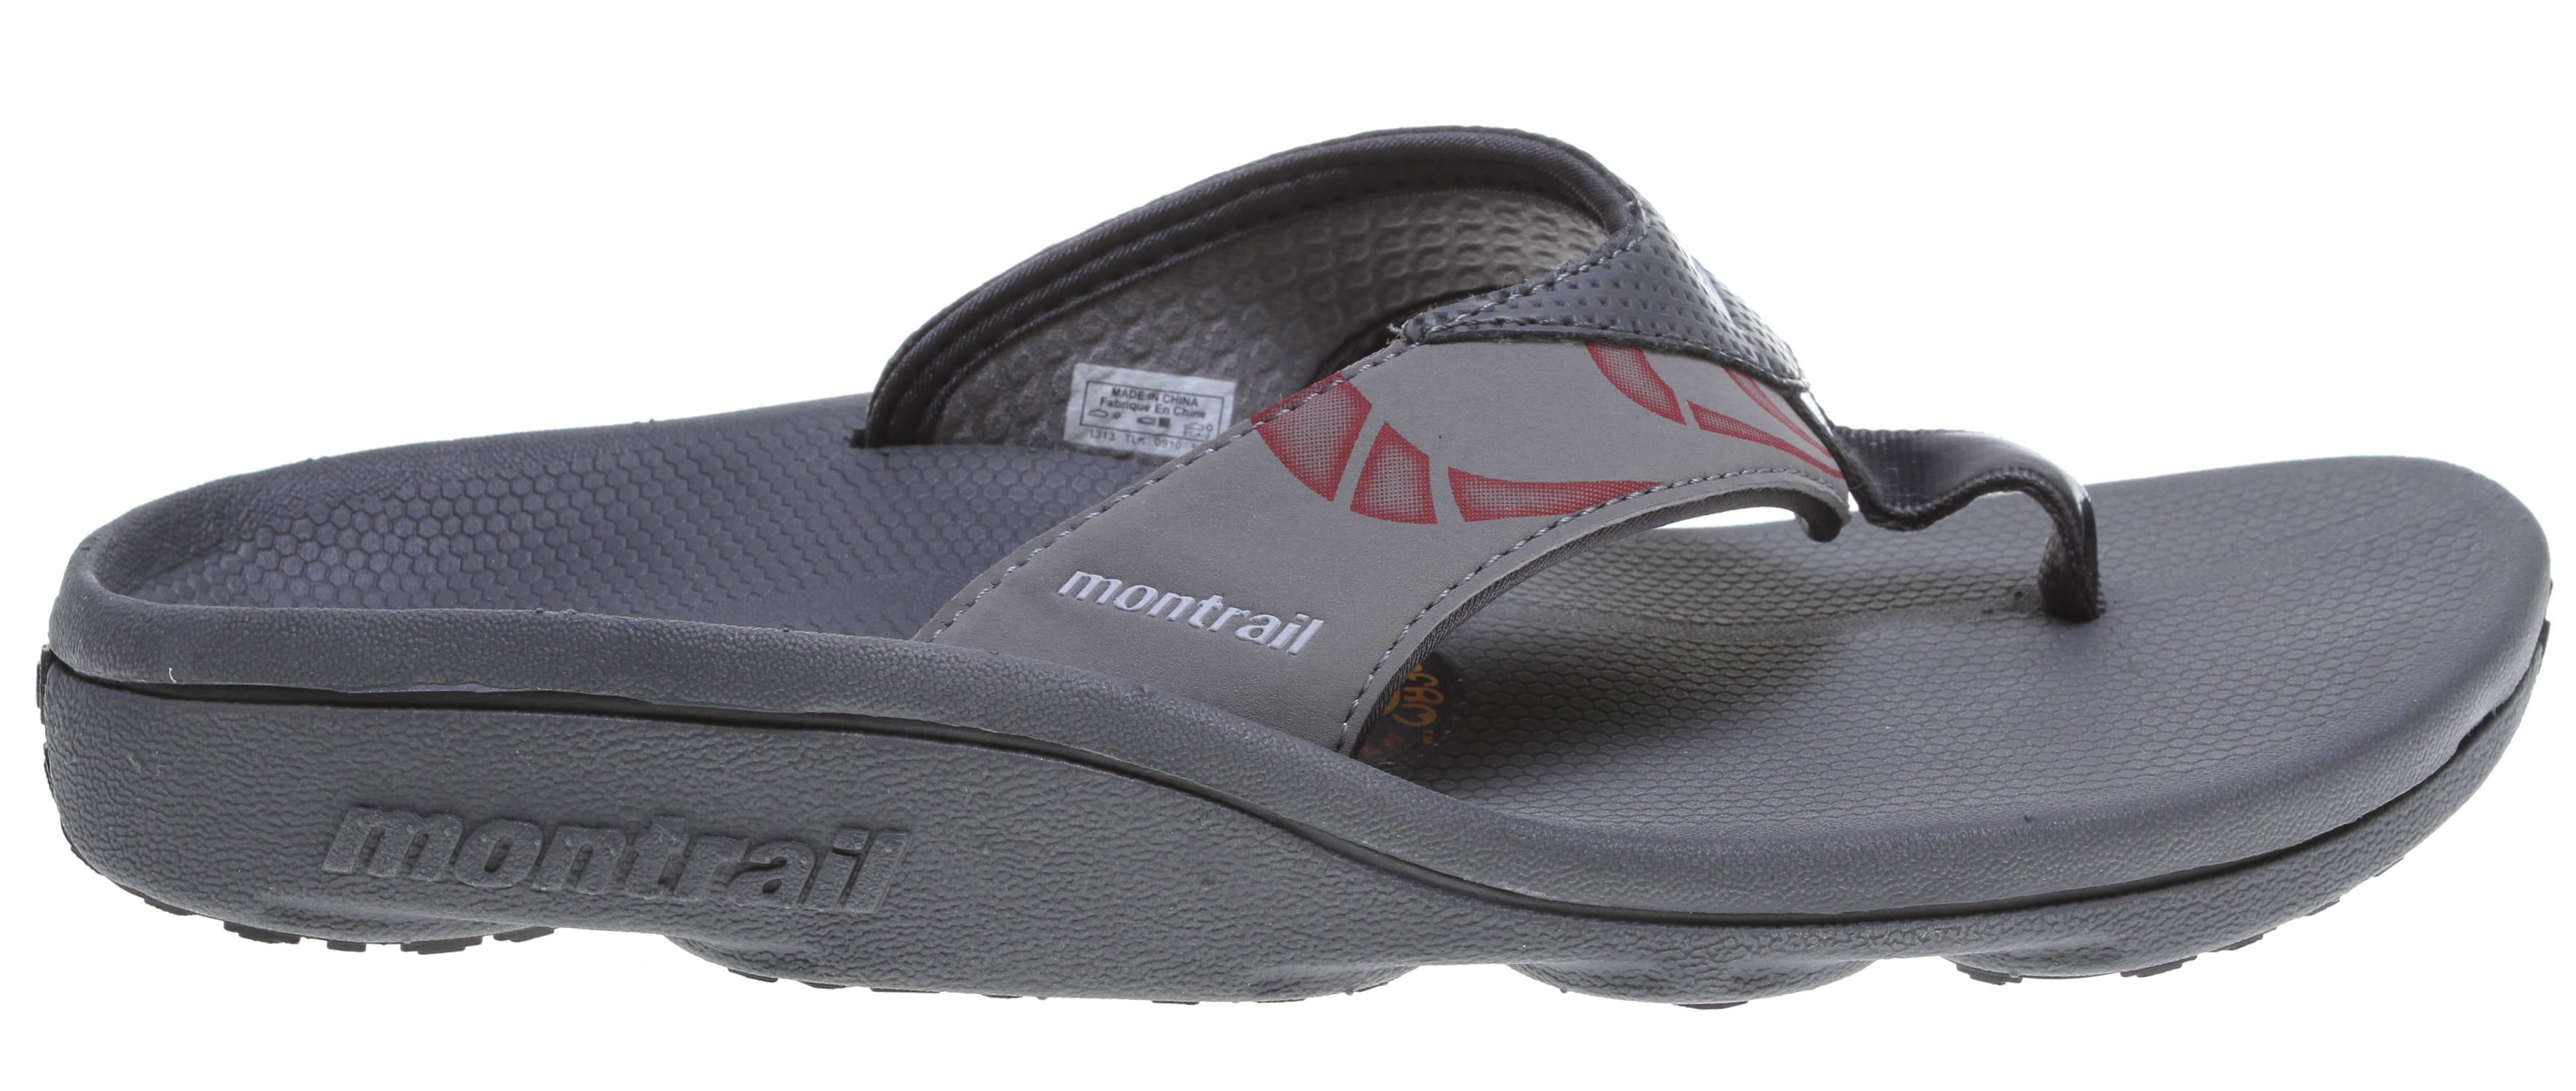 best cheap special discount run shoes Montrail Molokai Sandals